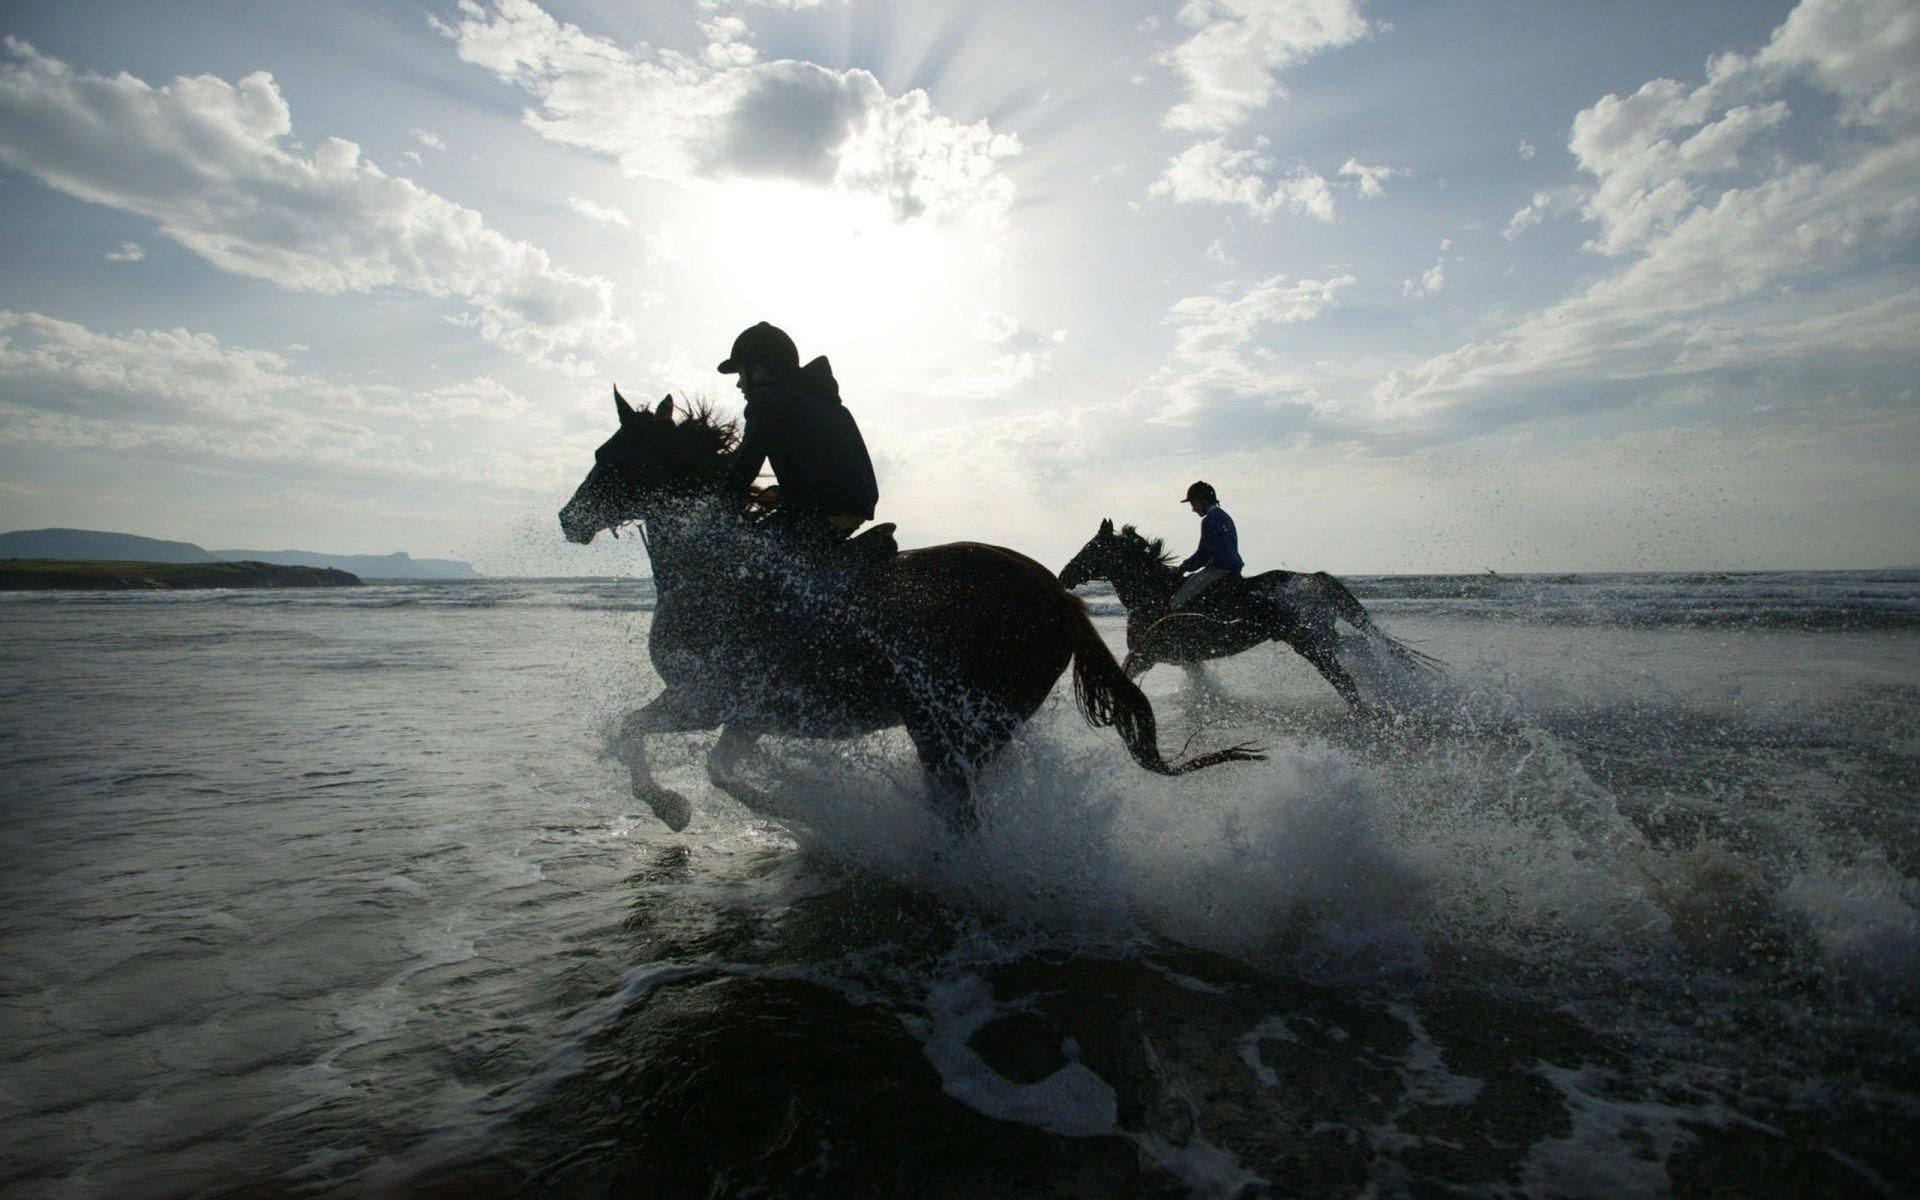 Download Wallpaper Horse Water - fe9b9c8cbbb1b60c05f72ebbb3e62427  Collection_142279.jpg